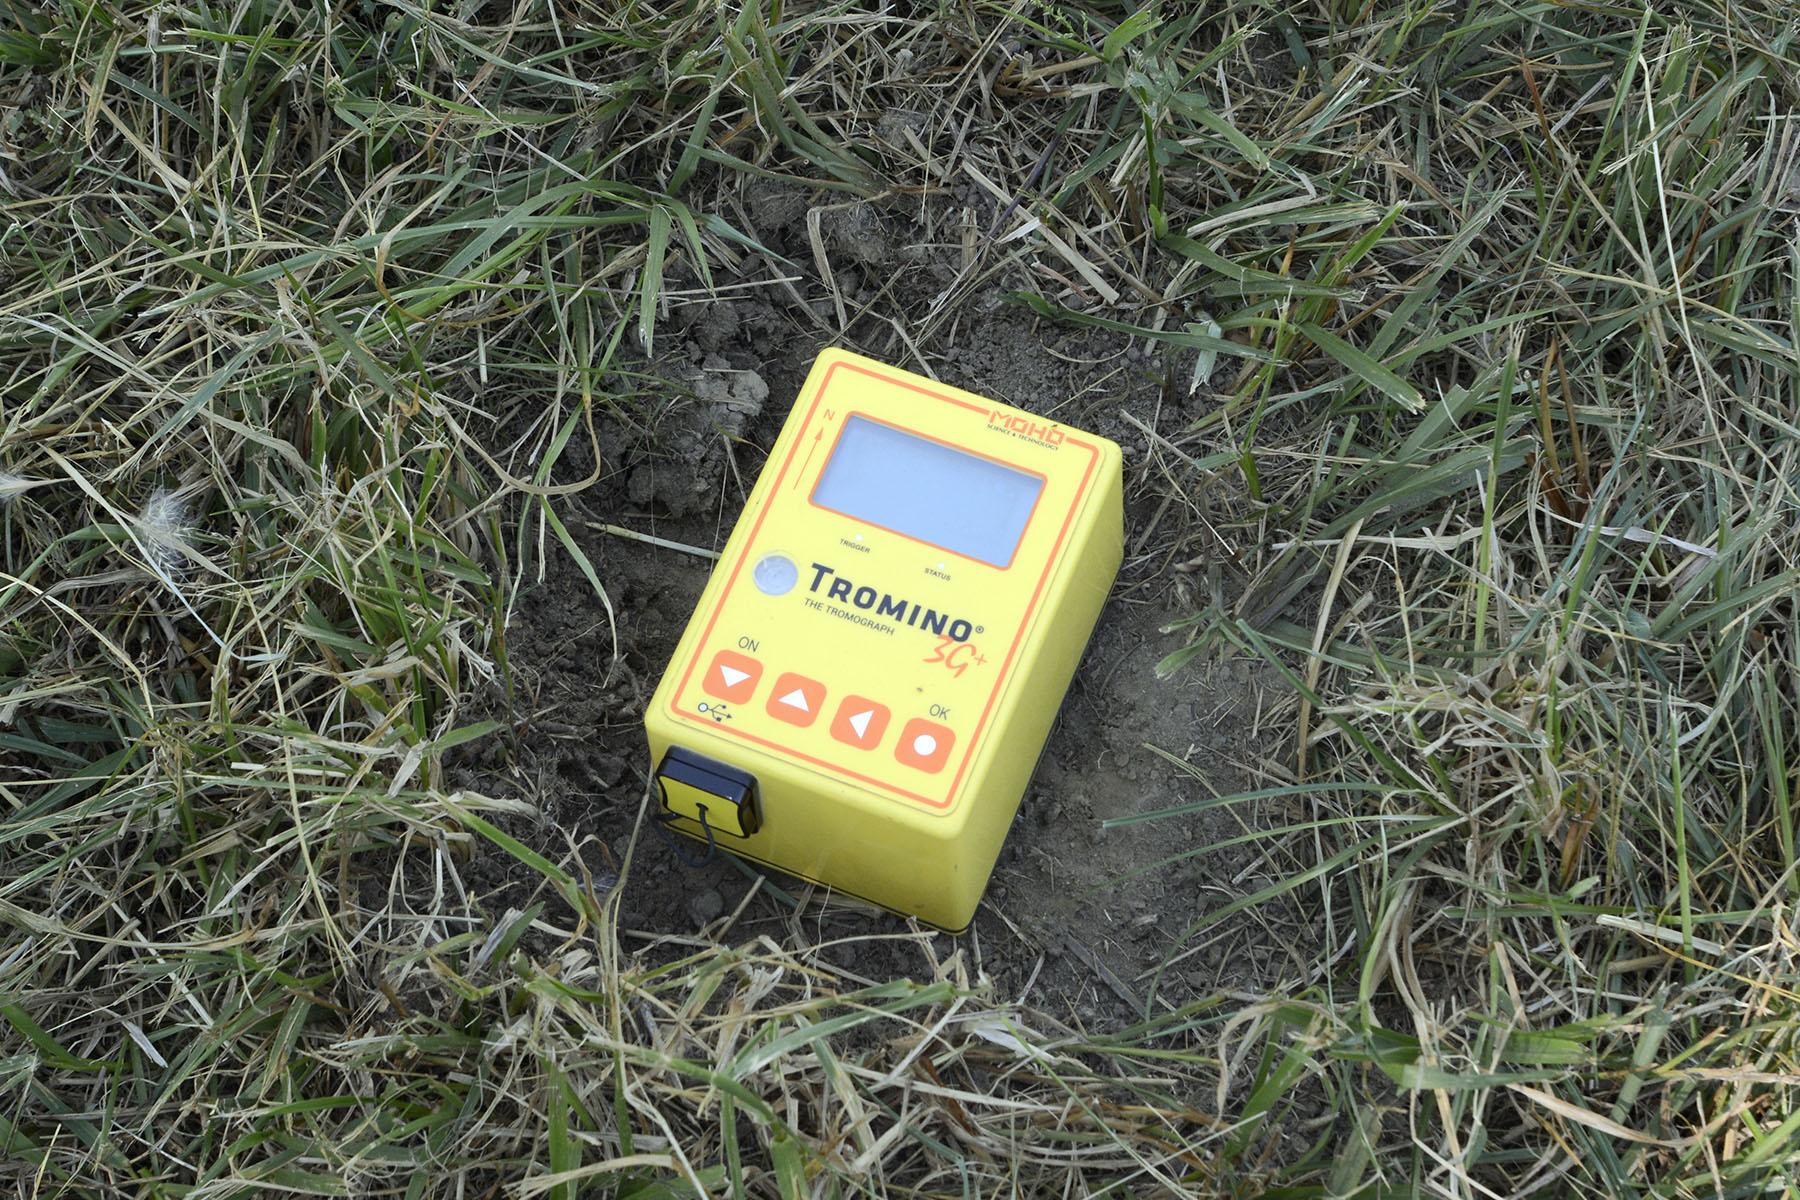 Tromino 3G passive seismic instrument